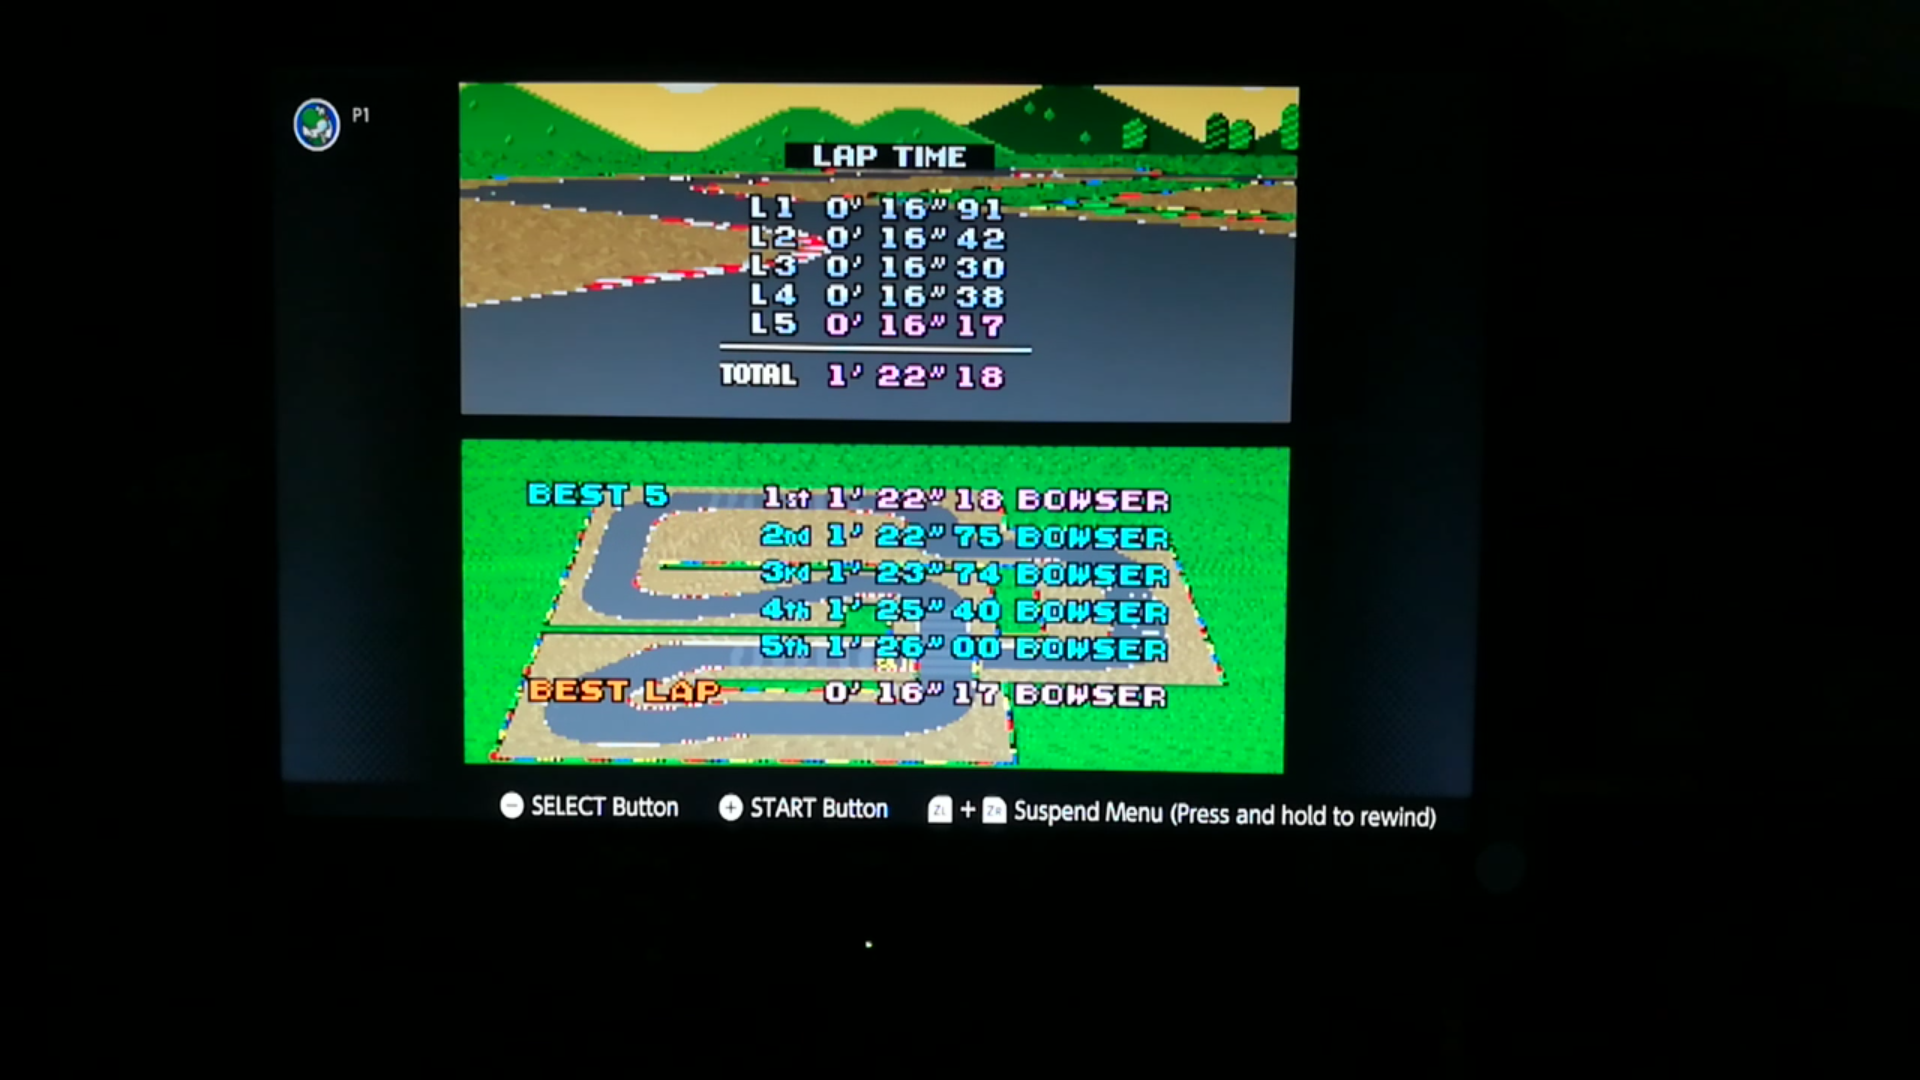 Mimitchi: Super Mario Kart: Mario Circuit 2 [Time Trial] [Lap Time] (SNES/Super Famicom Emulated) 0:00:16.17 points on 2020-04-03 15:24:22